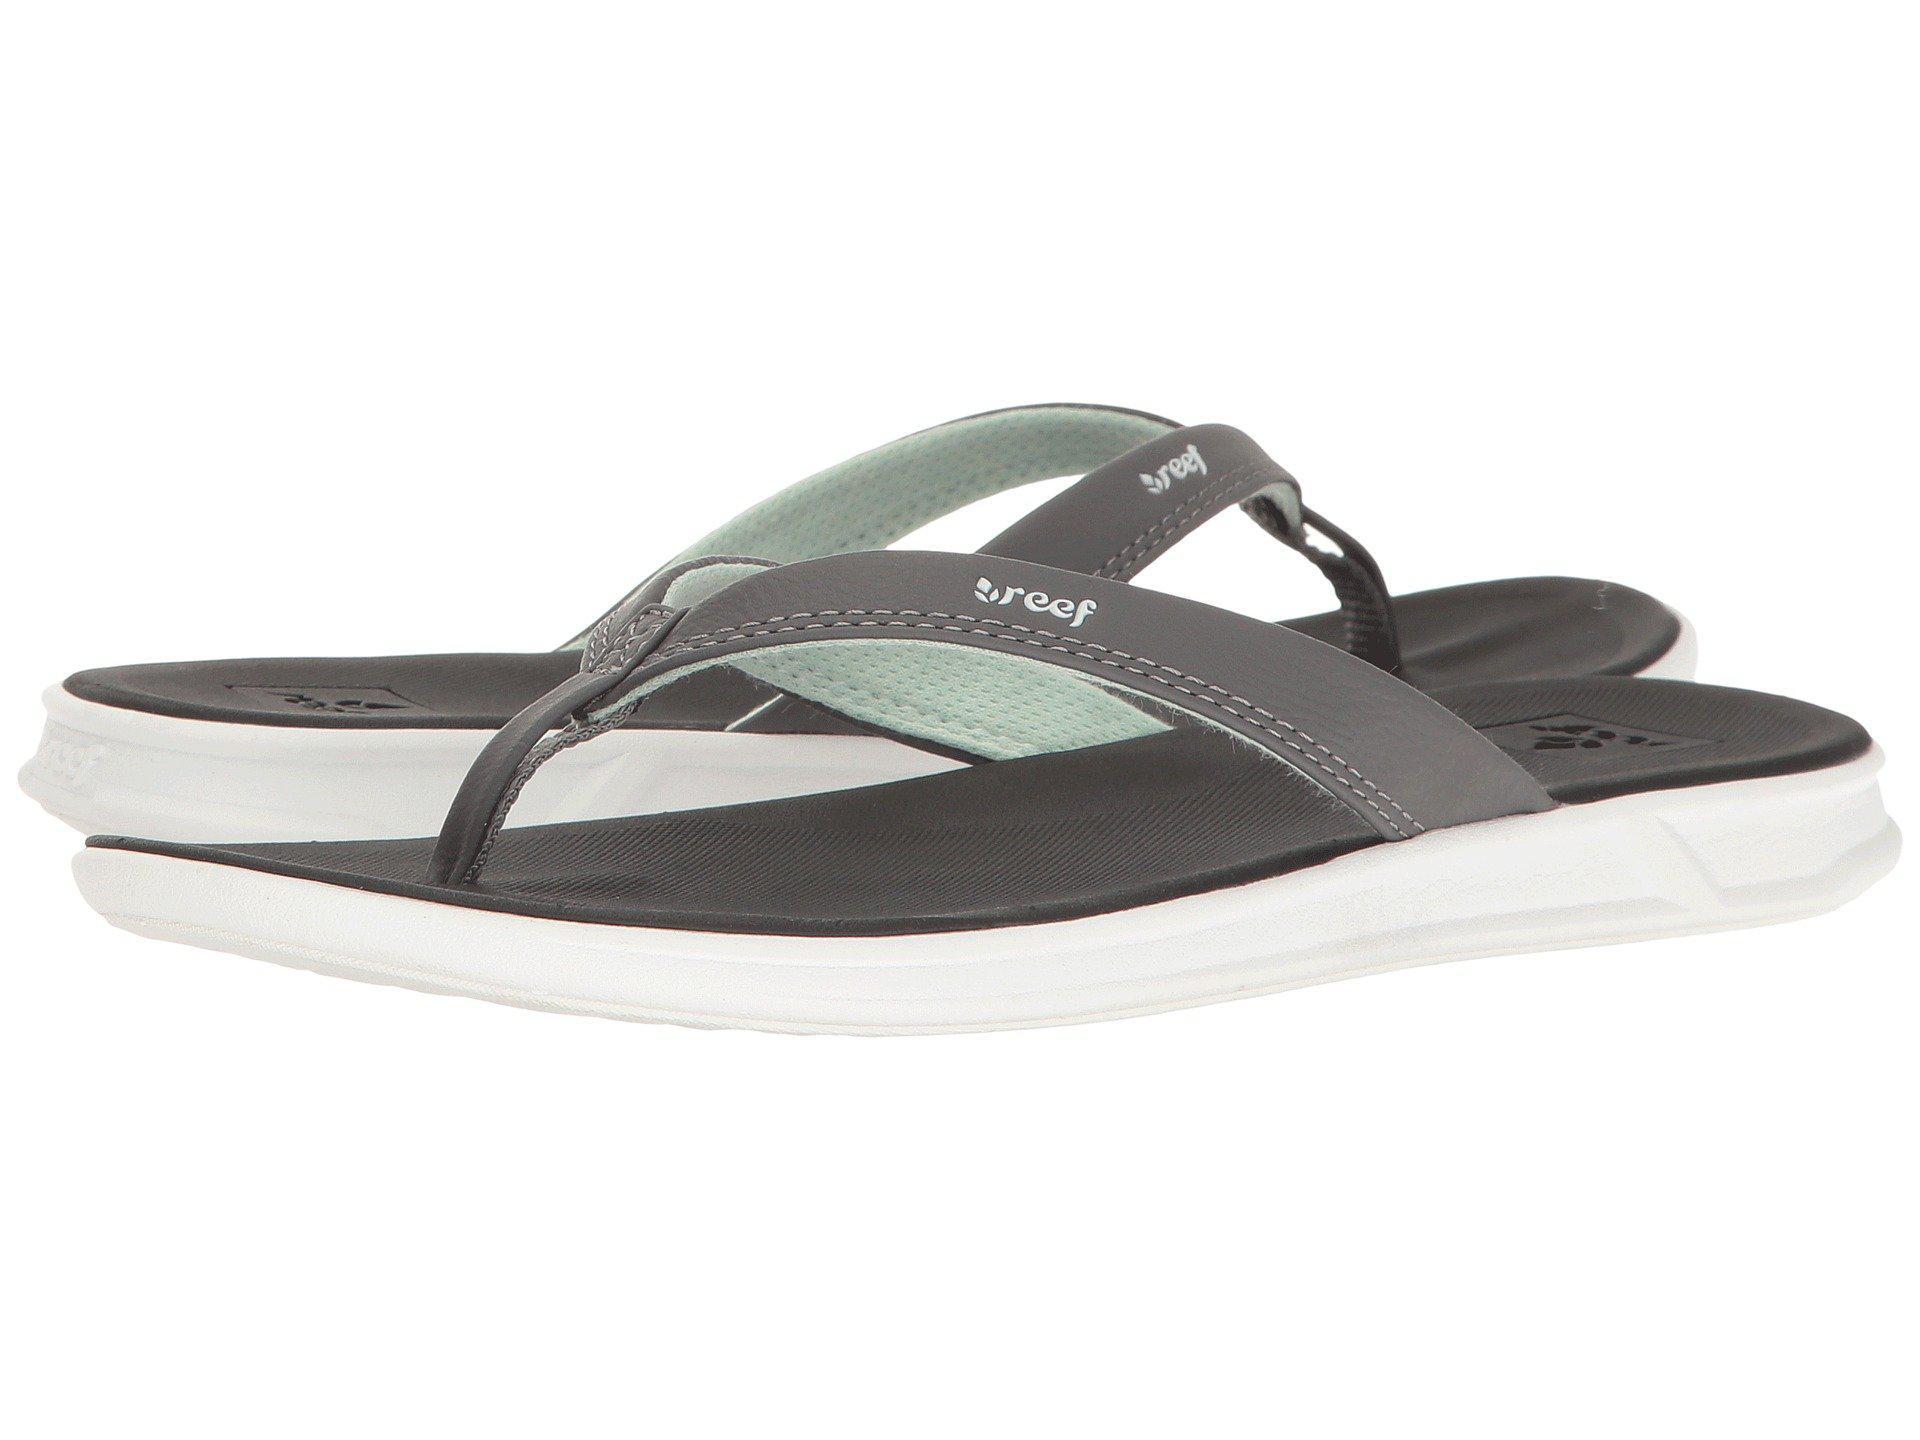 9f0195a8829d Lyst - Reef Rover Catch (black mint) Women s Sandals in Black